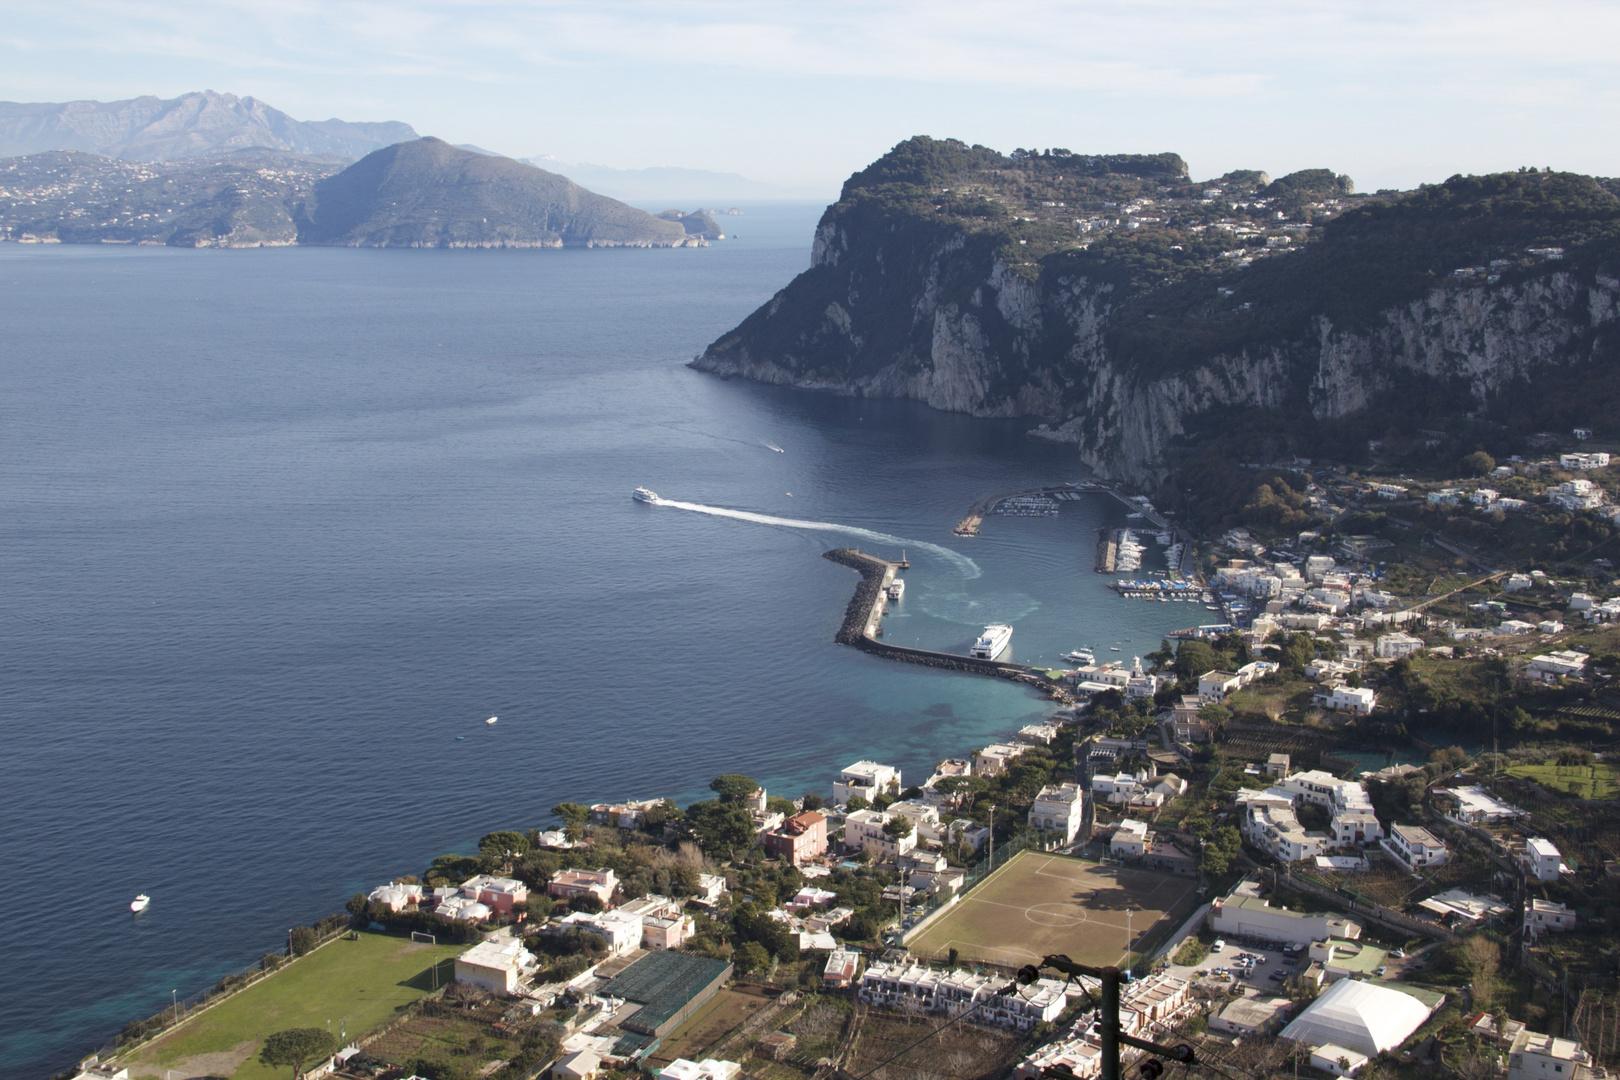 Capri from AnaCapri 2010